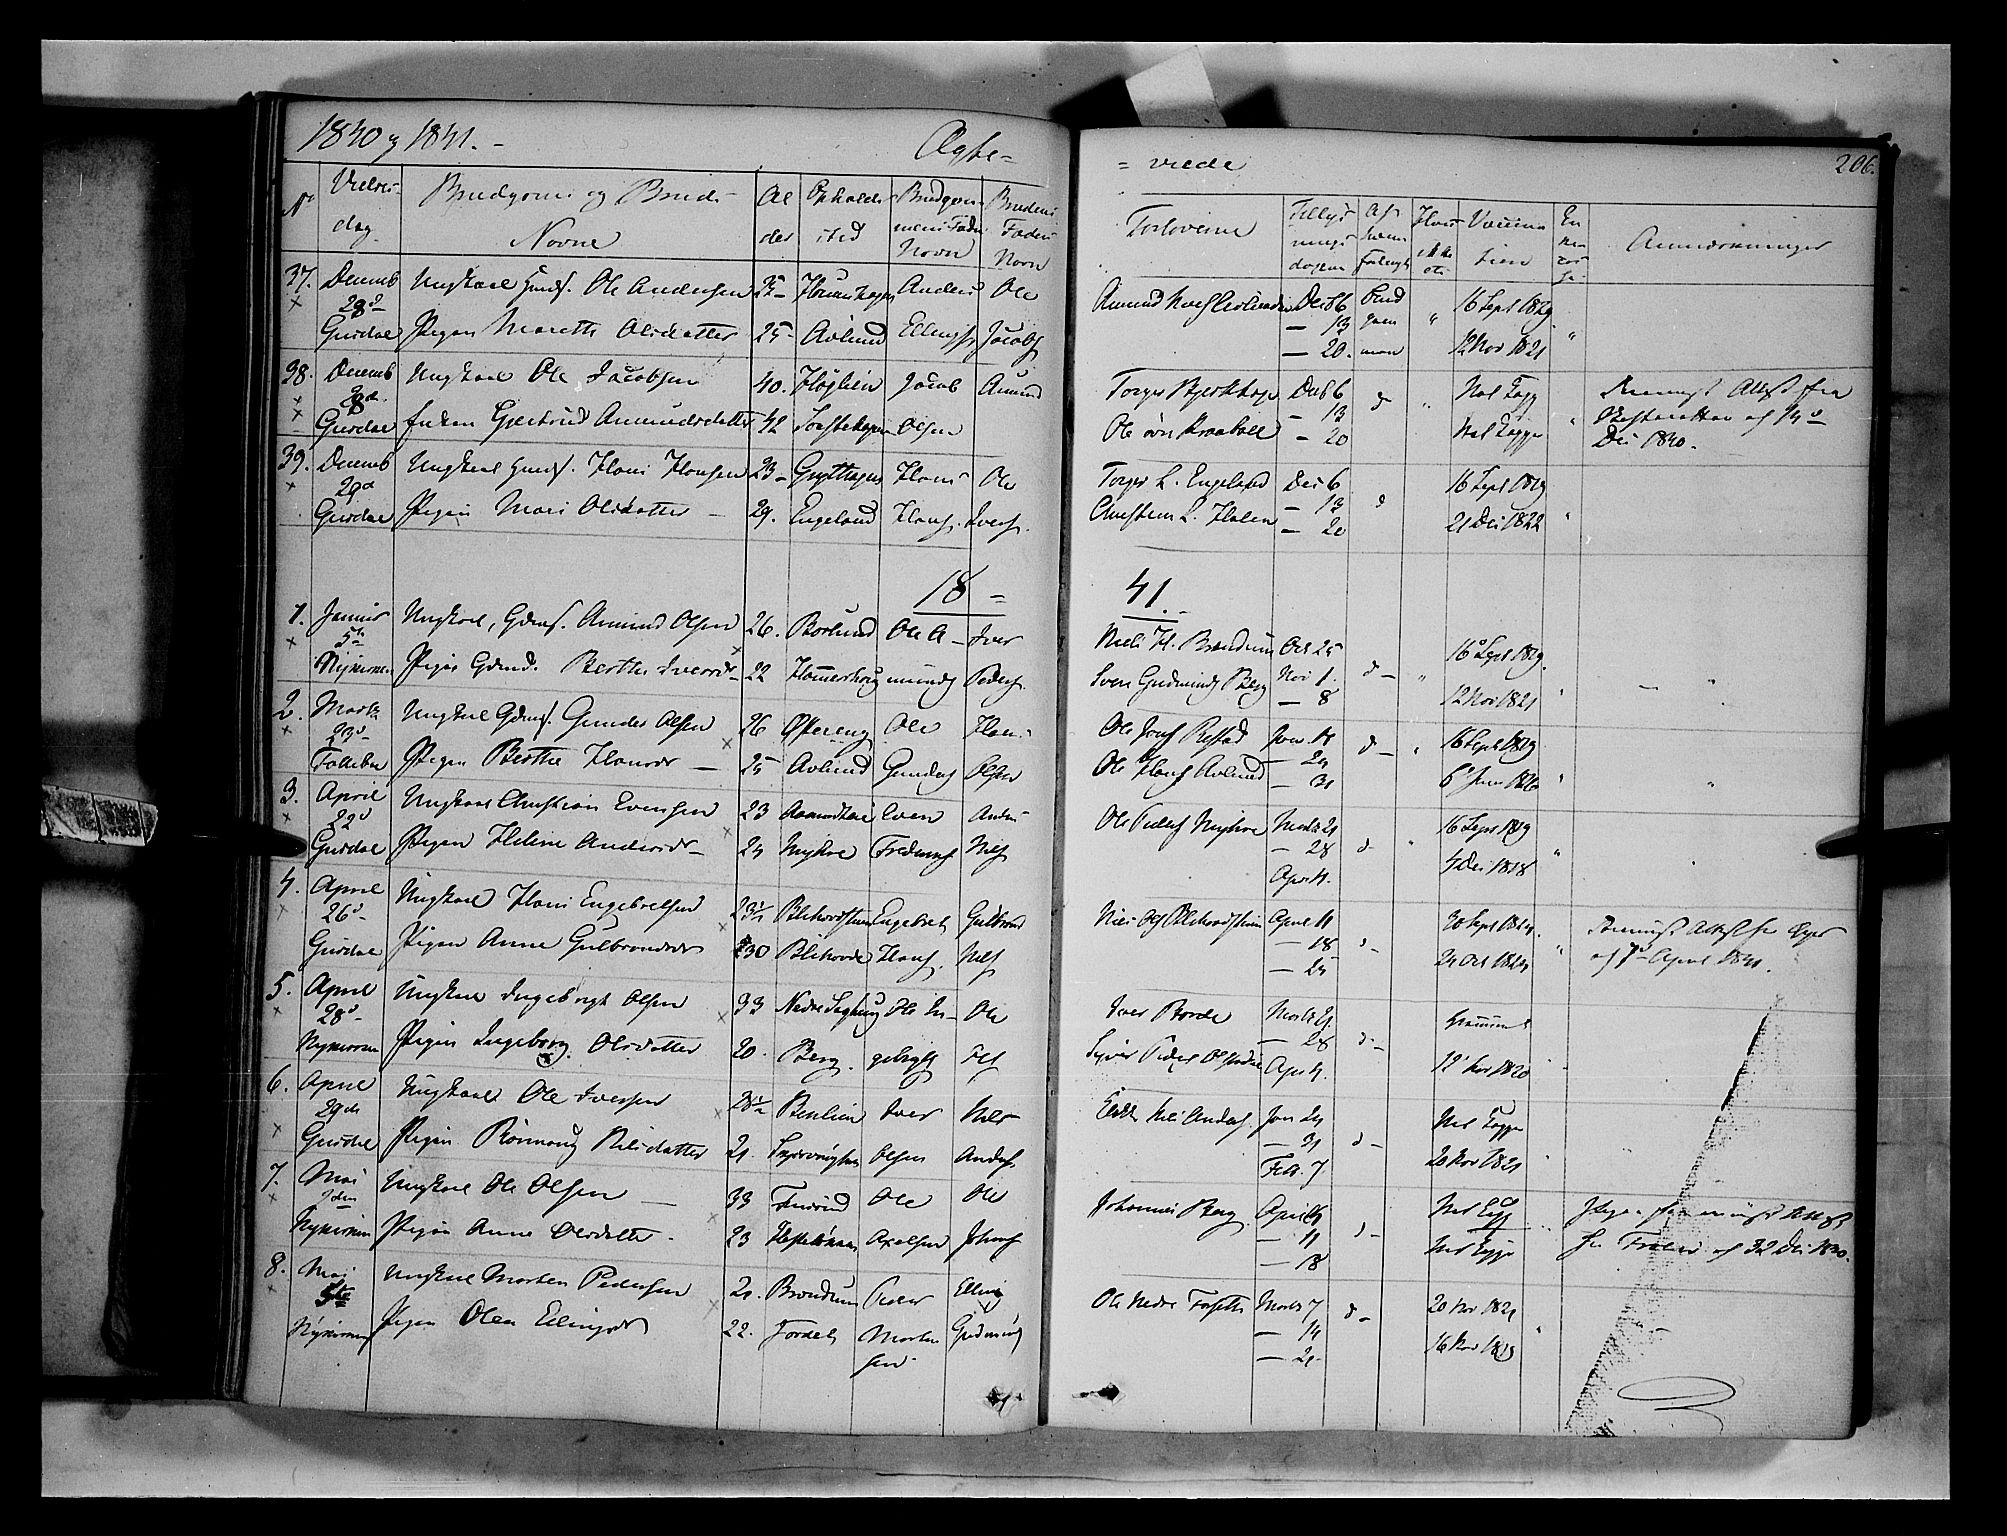 SAH, Gausdal prestekontor, Ministerialbok nr. 7, 1840-1850, s. 206